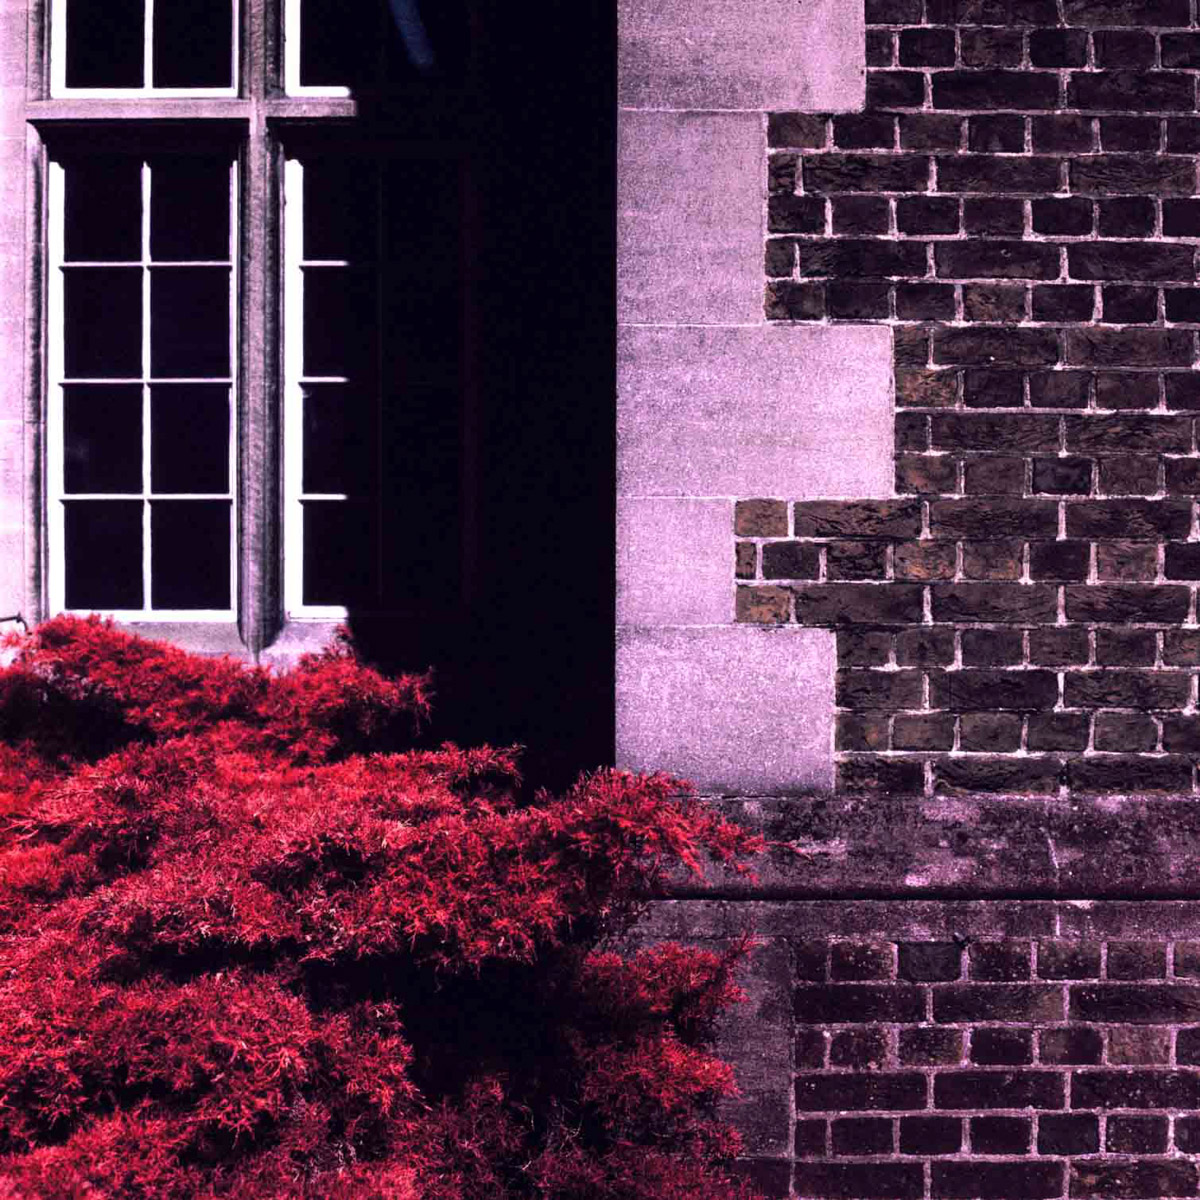 Kodak AEROCHROME III Infrared Film (1443), EI 400, 120 format - Hasselblad 2000FCW, Carl Zeiss Planar T* 80mm f/2.8 F